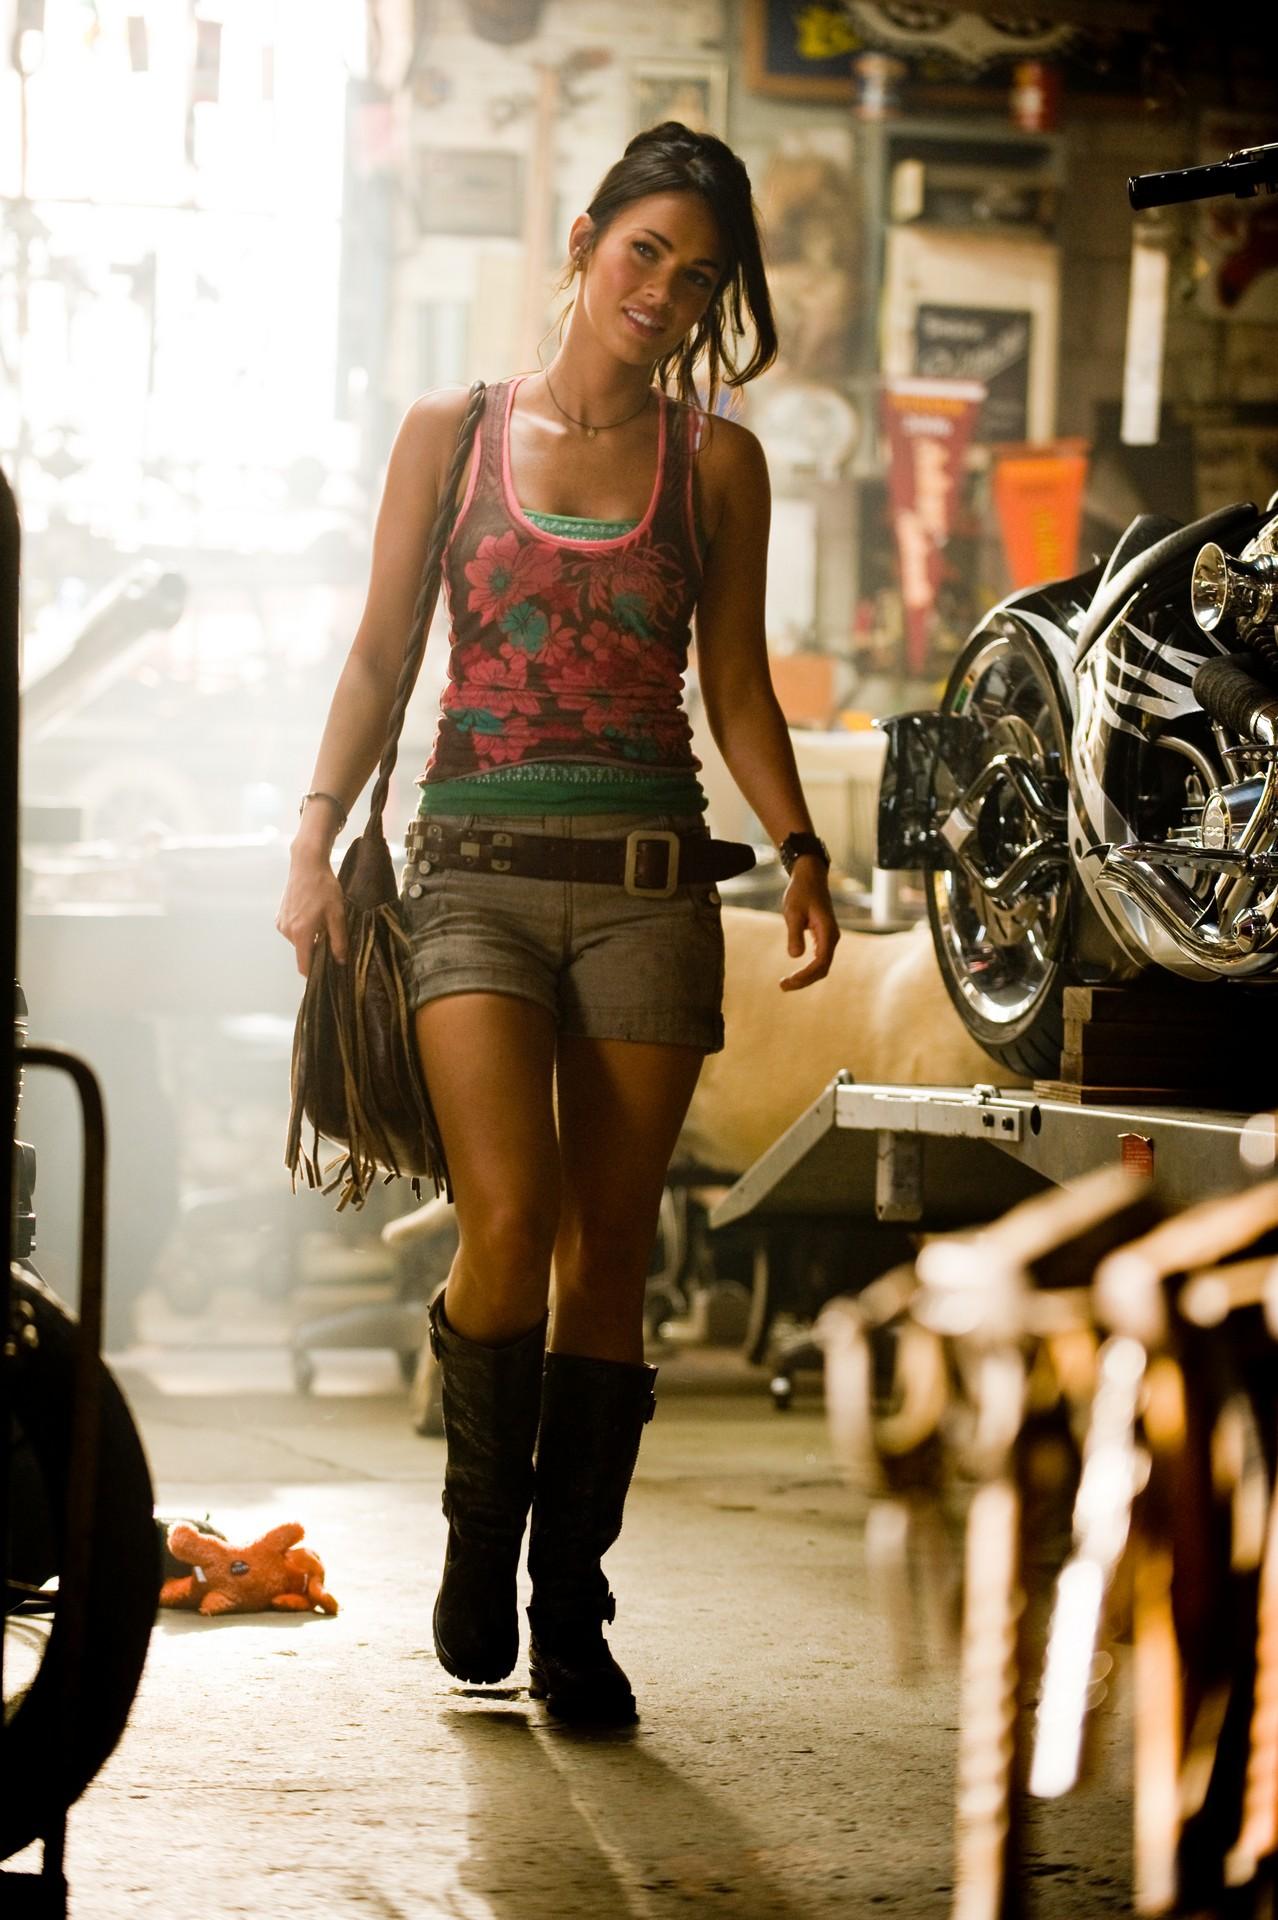 http://media.kino-govno.com/images/transformers2/transformers2_22.jpg